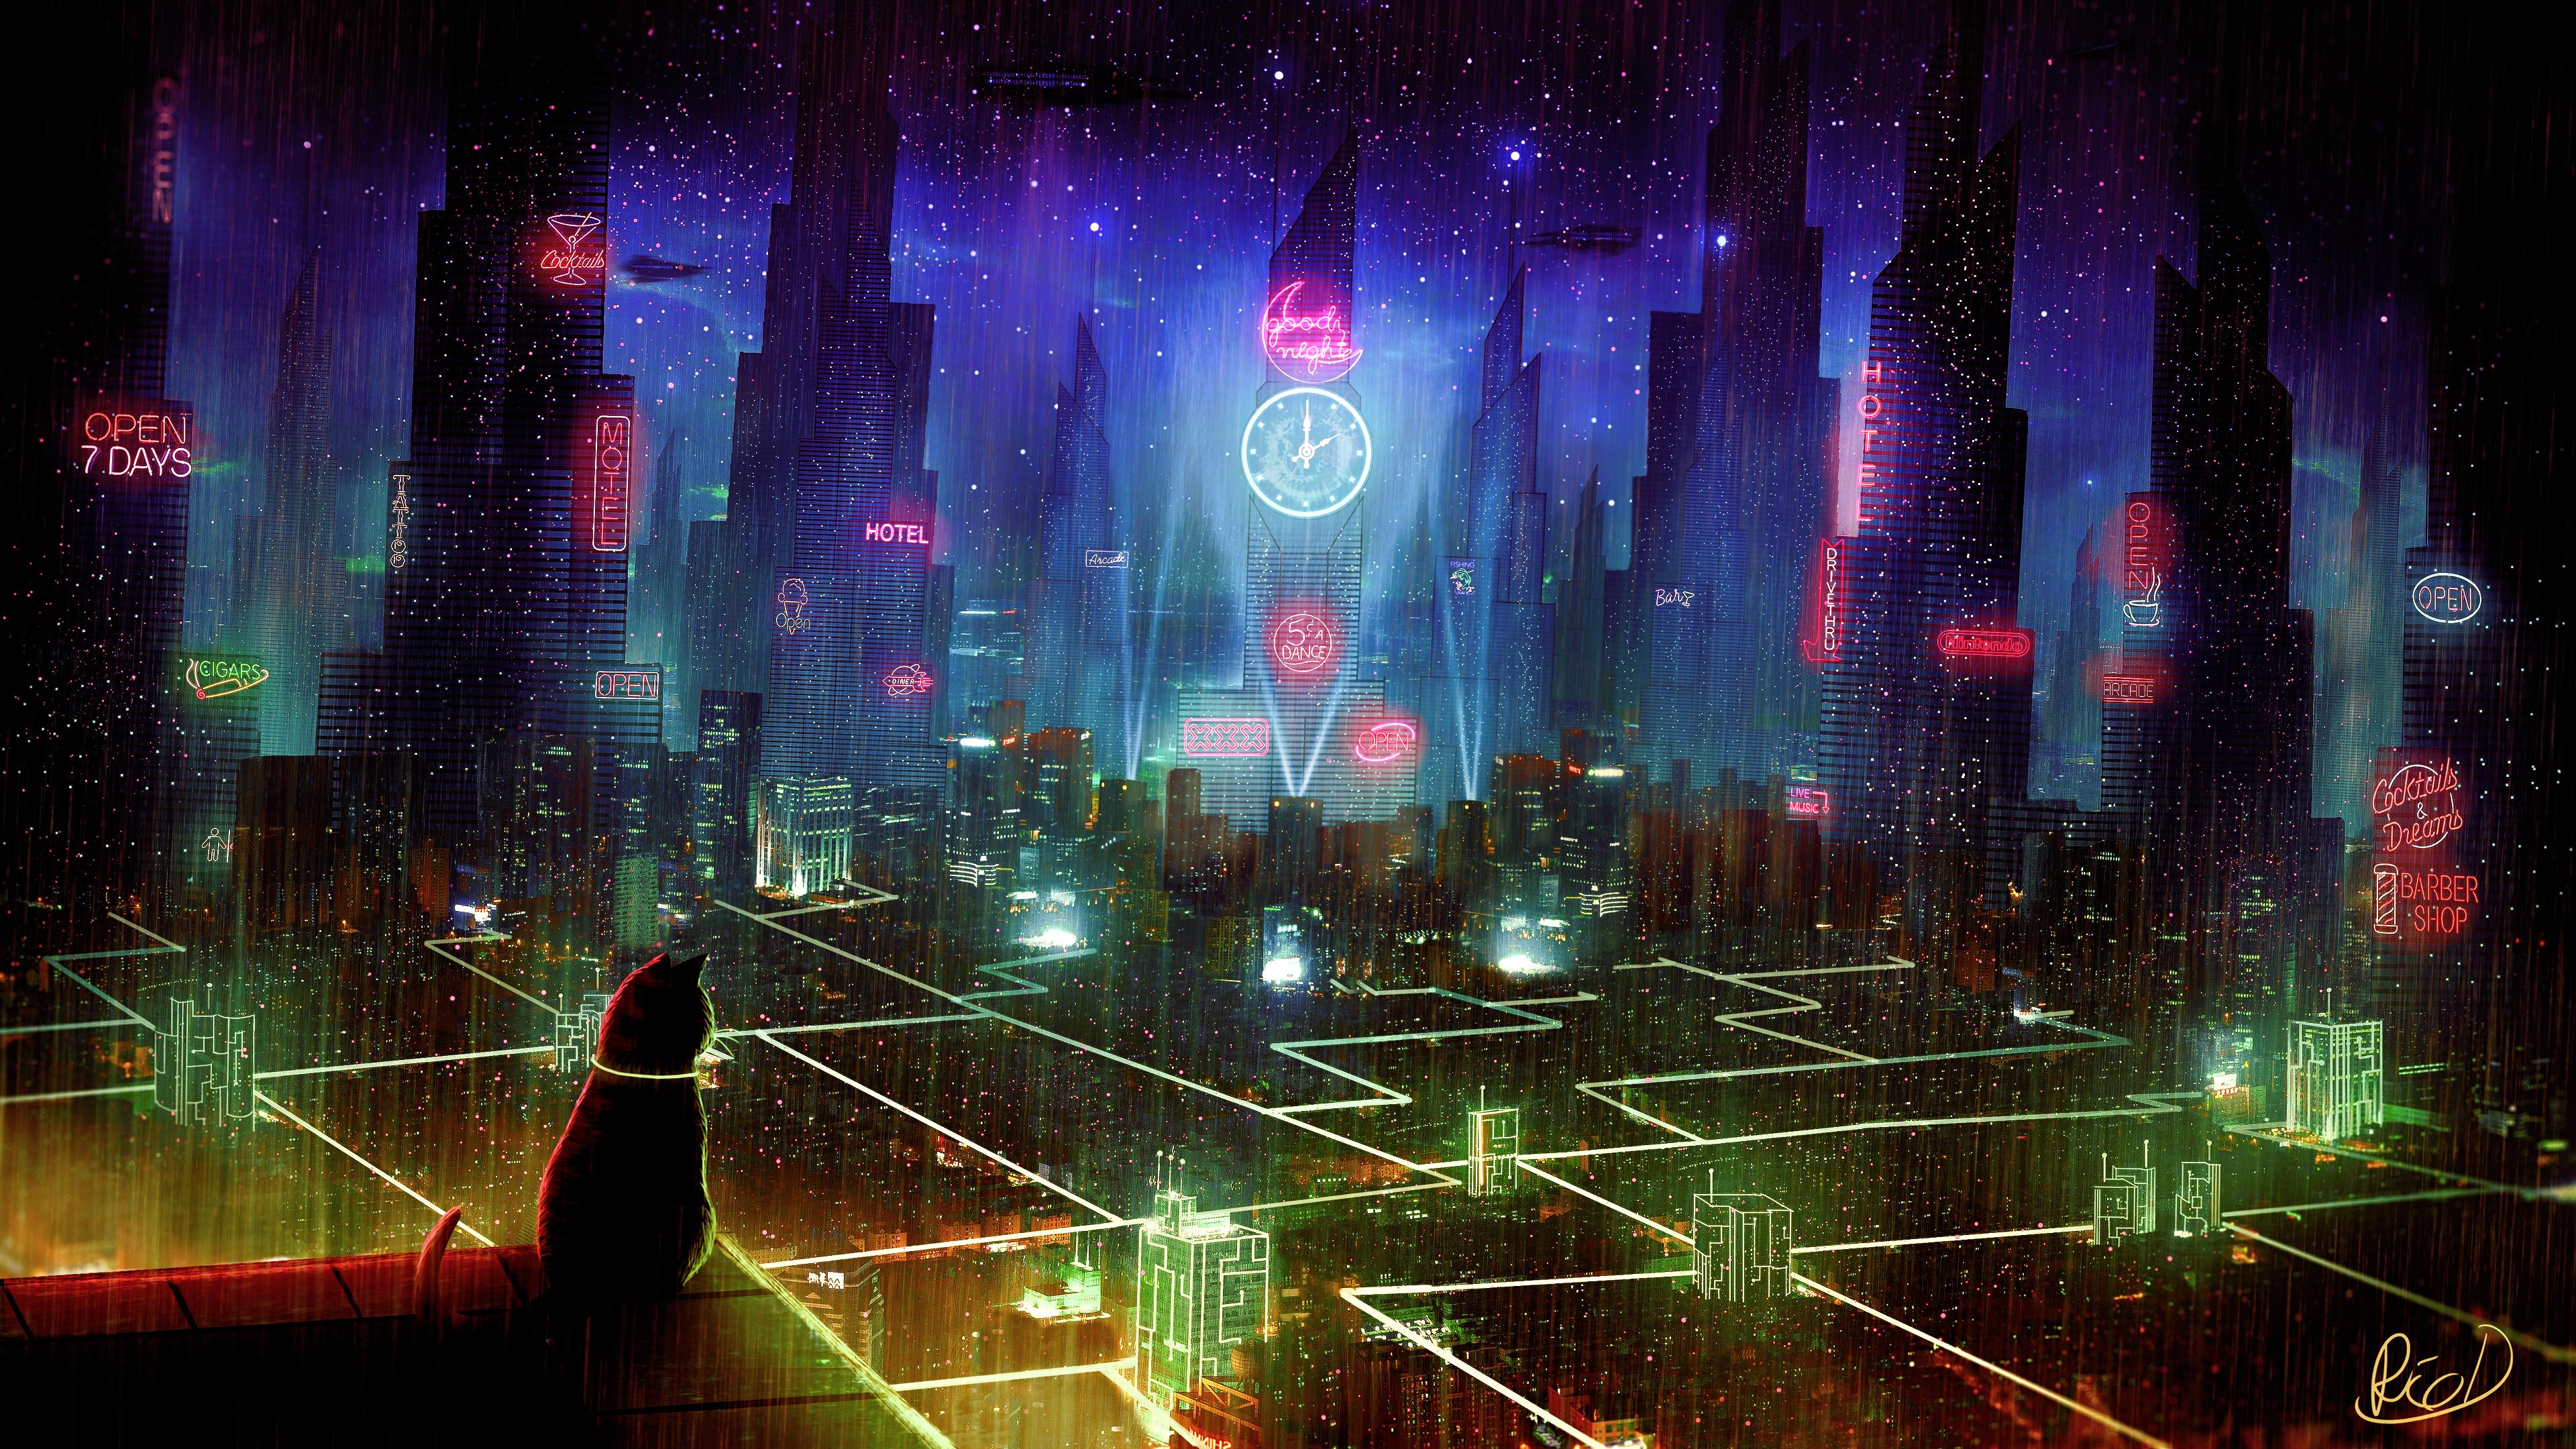 General 3840x2160 cyber science fiction digital art concept art cyberpunk artwork futuristic fantasy art fan art 3D PC gaming cityscape futuristic city CGI space spaceship Star Citizen ArtStation